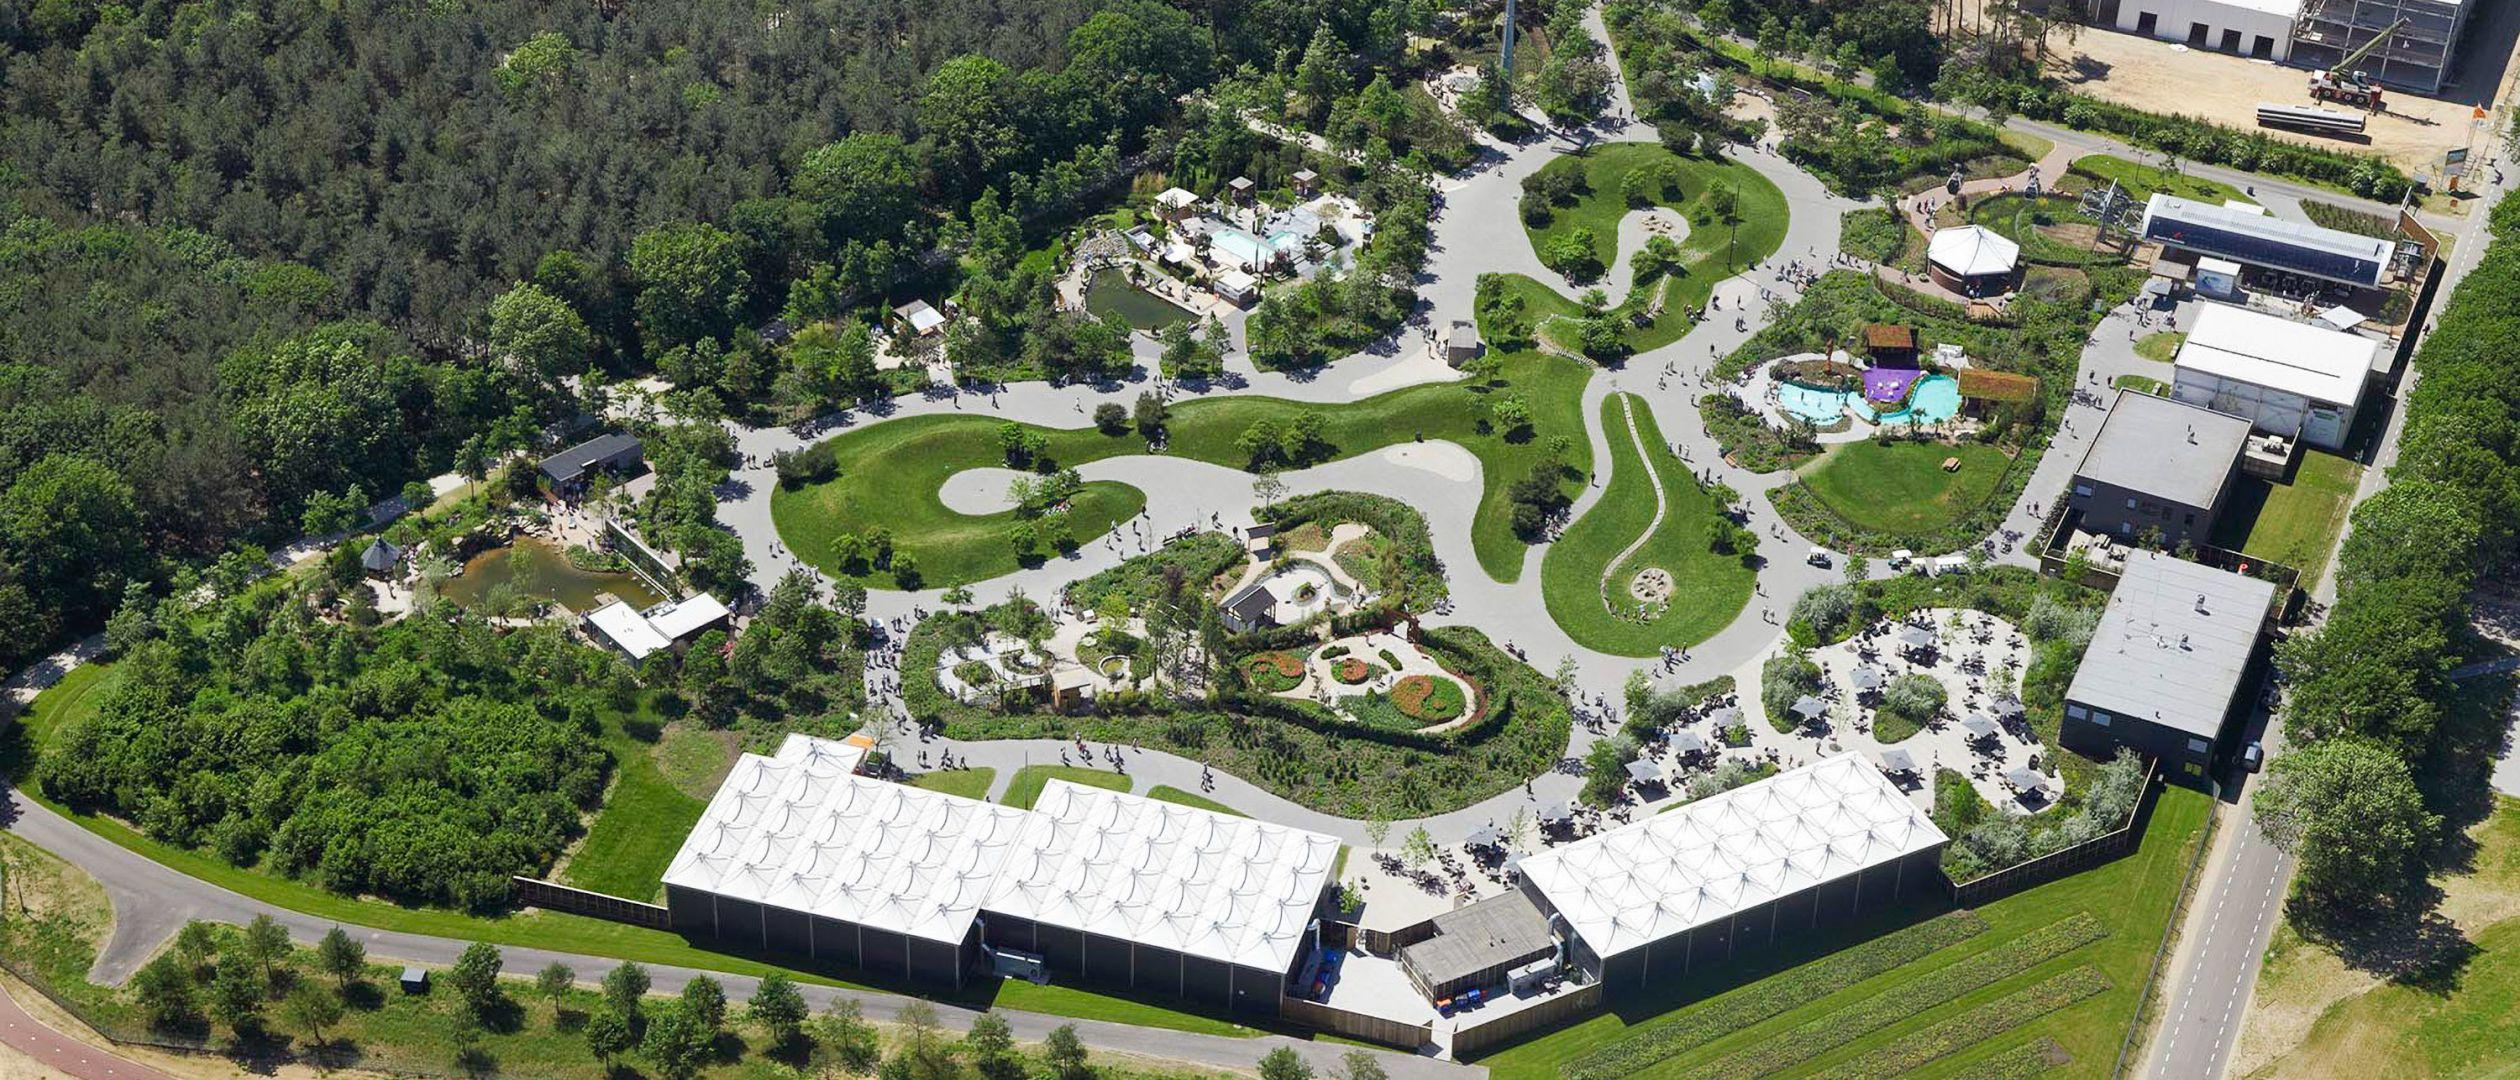 Belevingspark, Wereldtuinbouw -tentoonstelling Floriade 2012